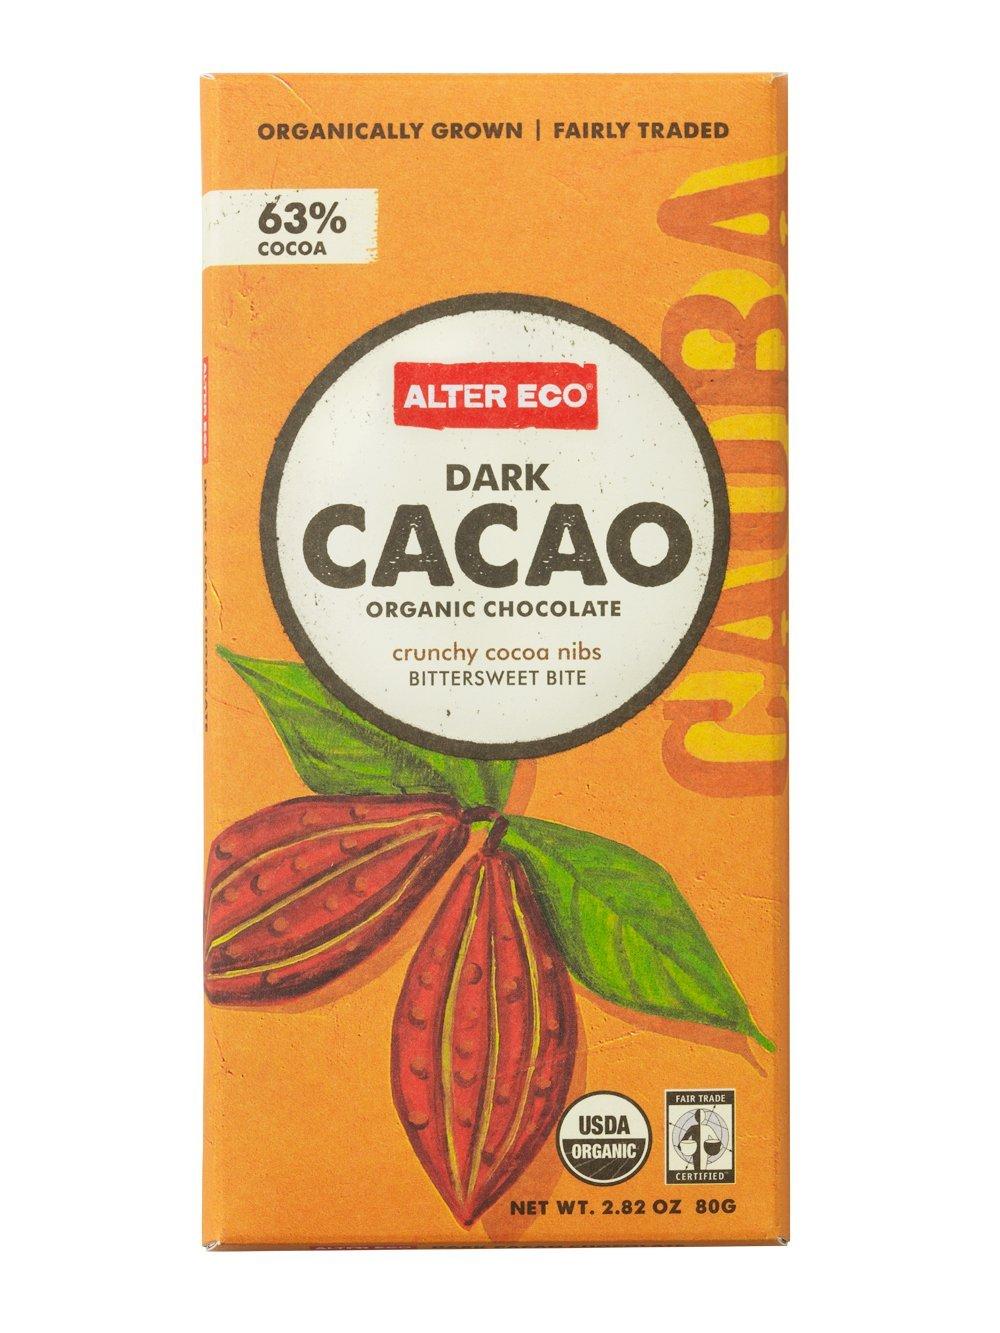 Amazon.com : Alter Eco - Dark Cacao Organic Chocolate - 2.82 oz ...